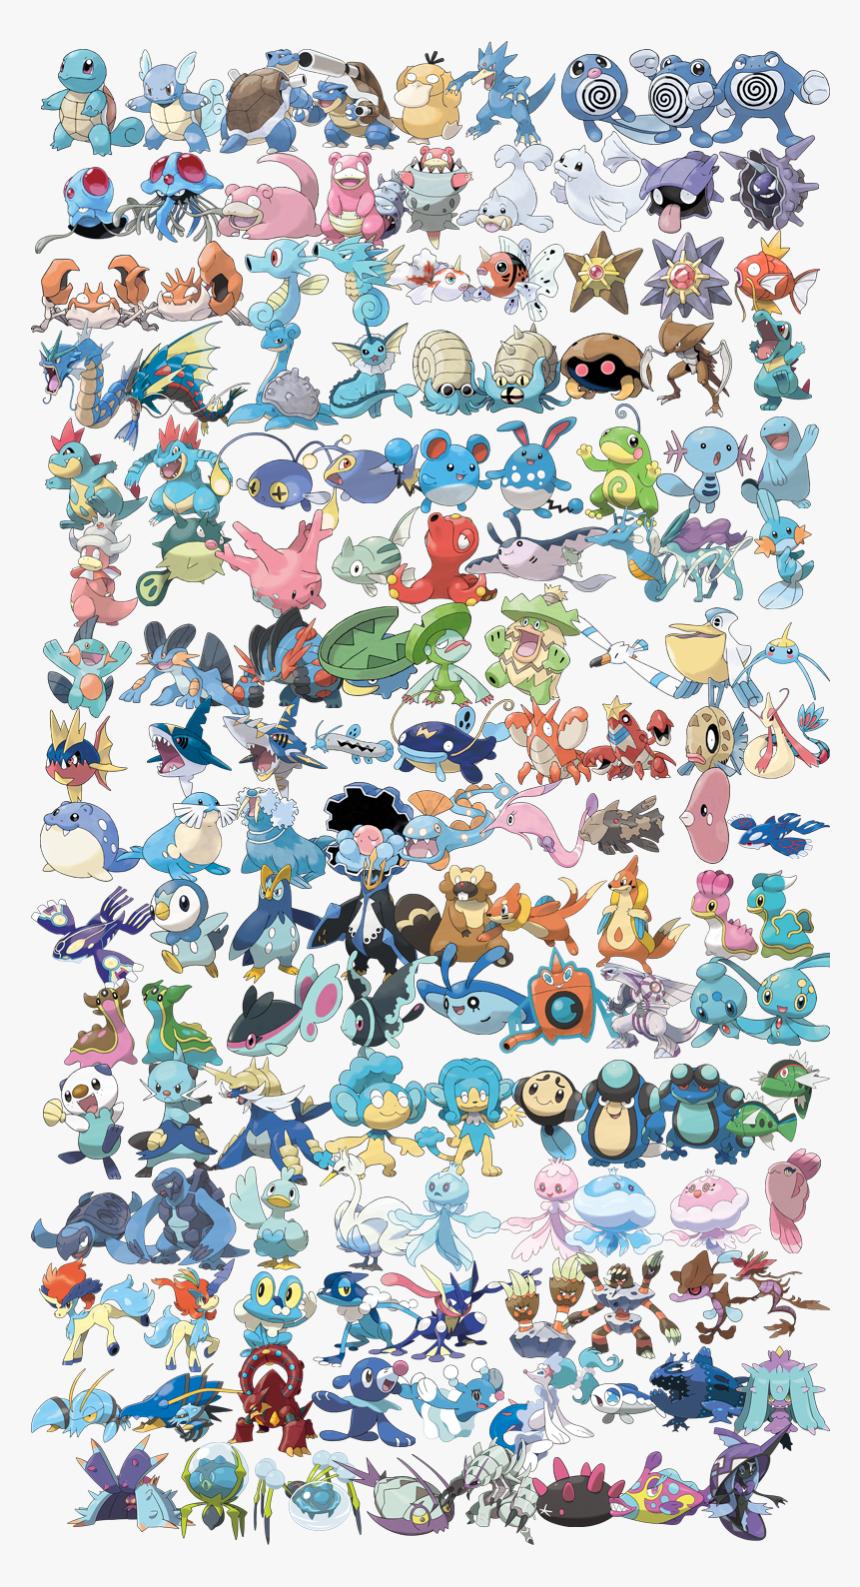 Image - Water Type Pokemon, HD Png Download, Free Download